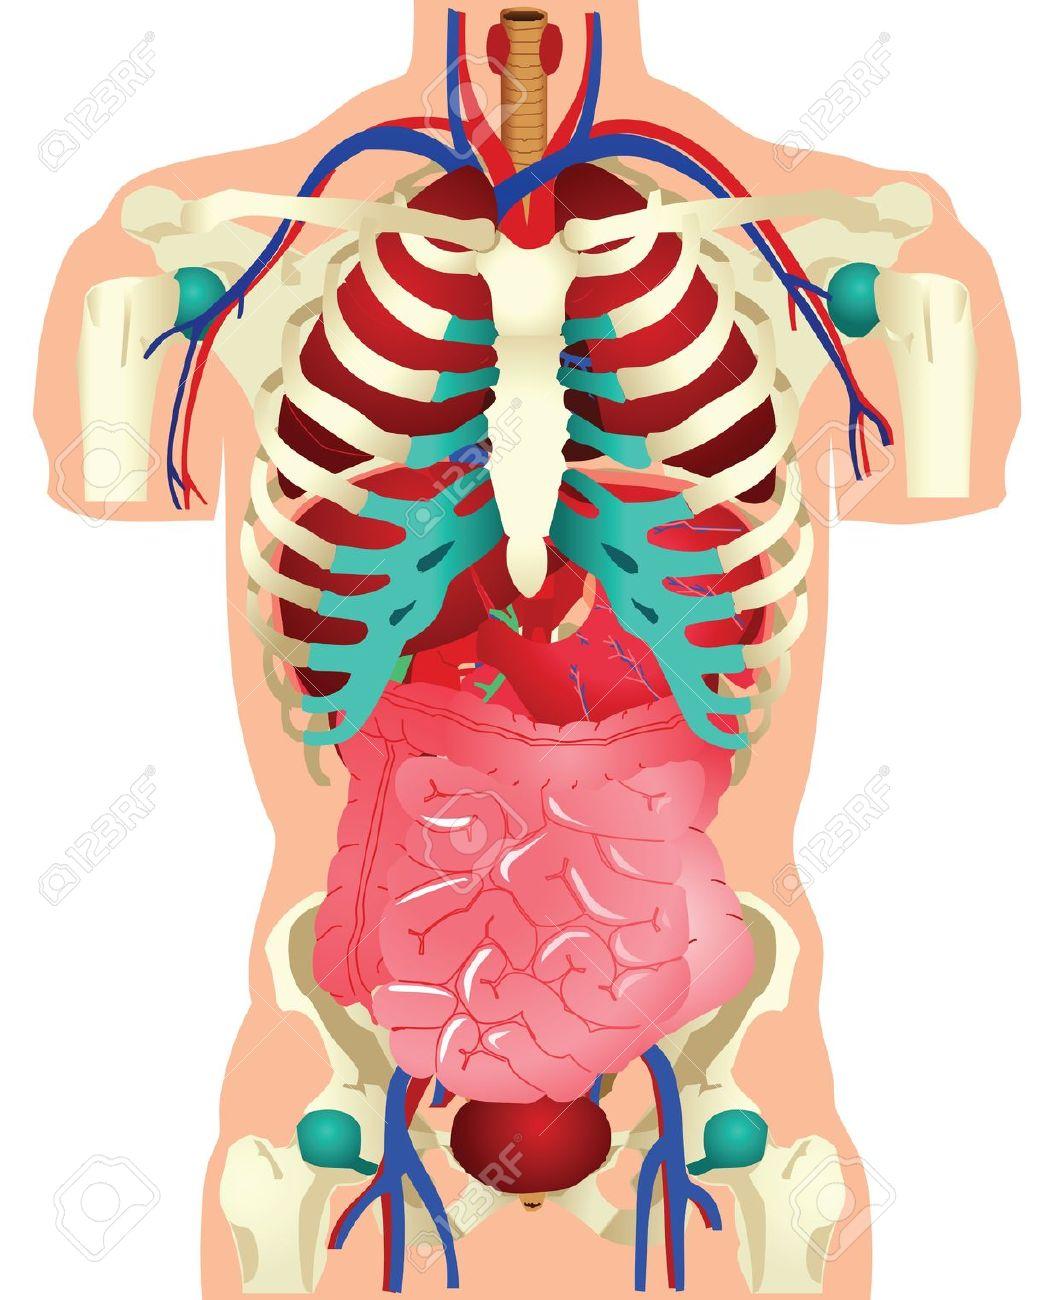 Anatomy clipart Clipart body%20clipart Free Anatomy Panda